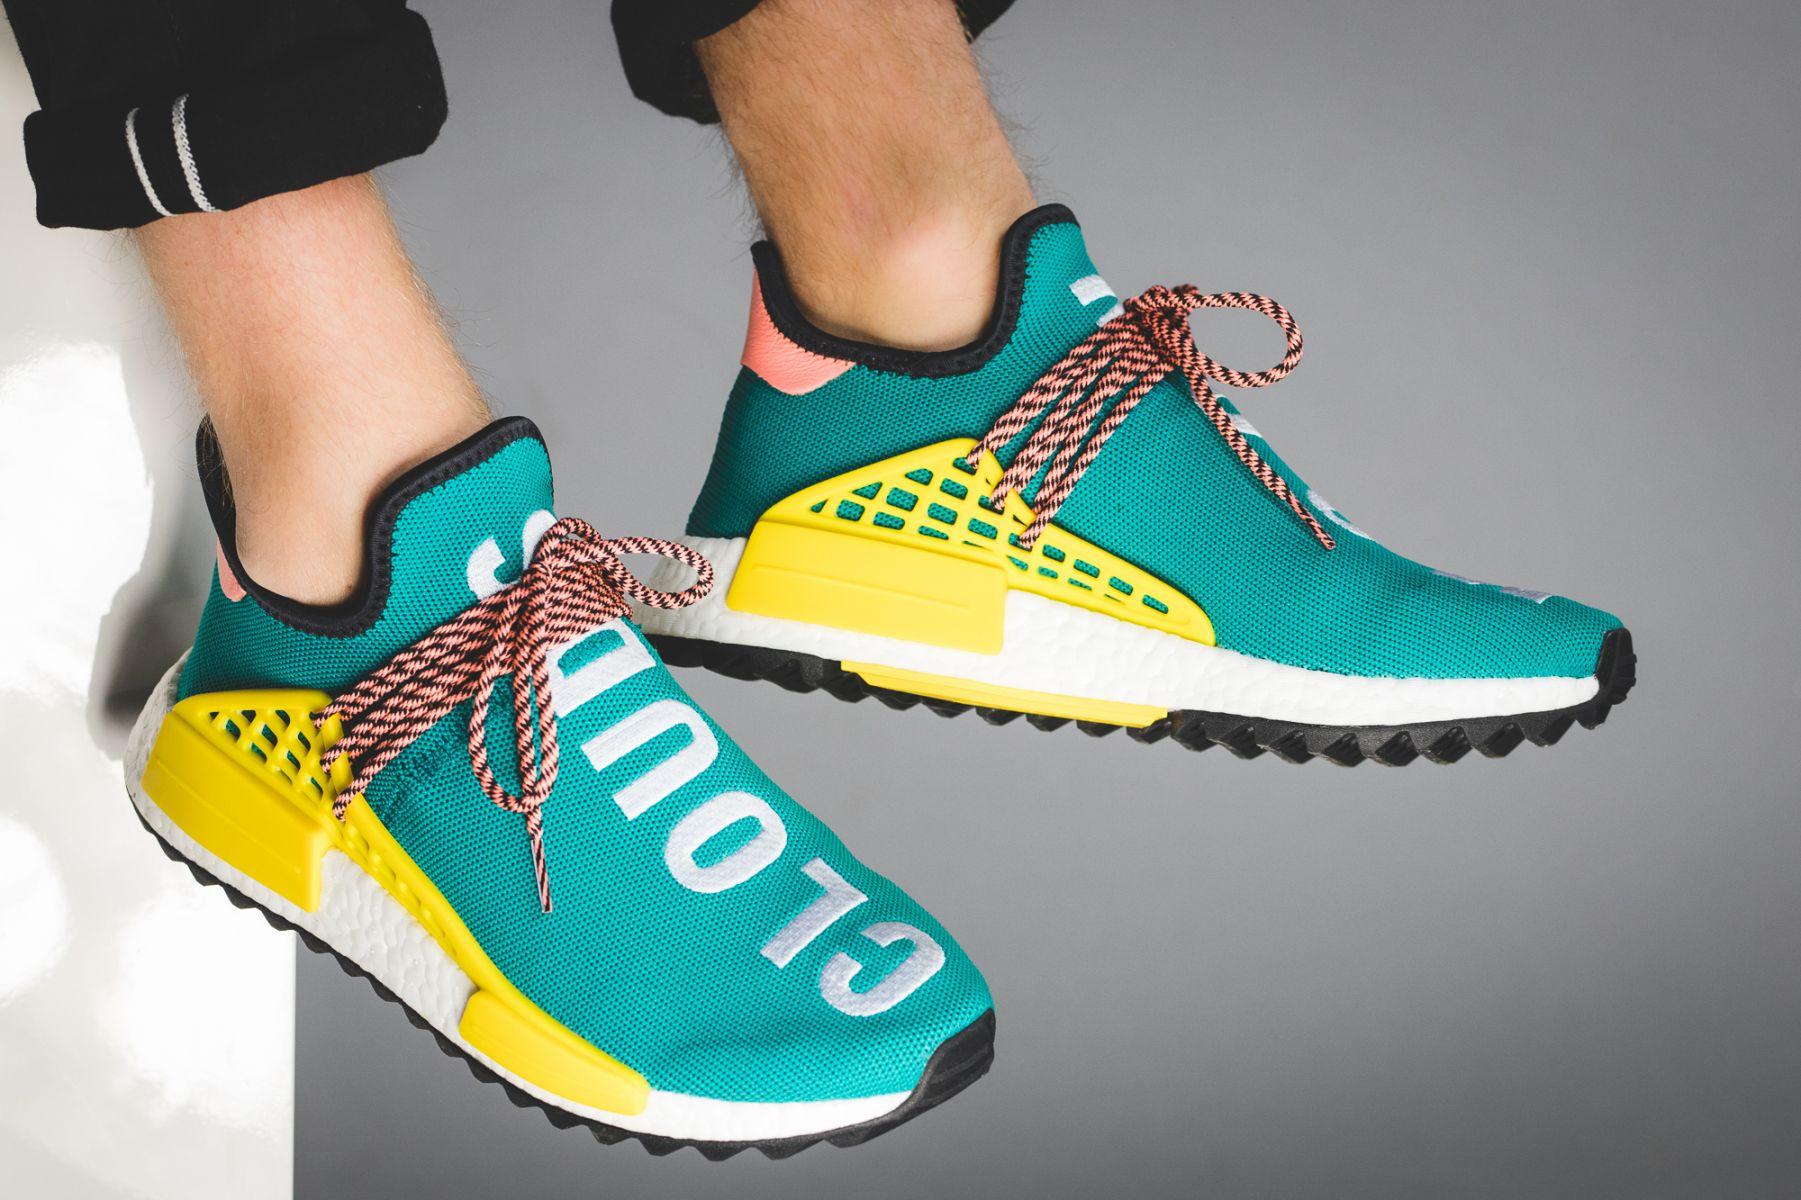 adidas-x-pharrell-williams-human-race-nmd-turquoise-ac7188-mood-1 ... a0d24a485